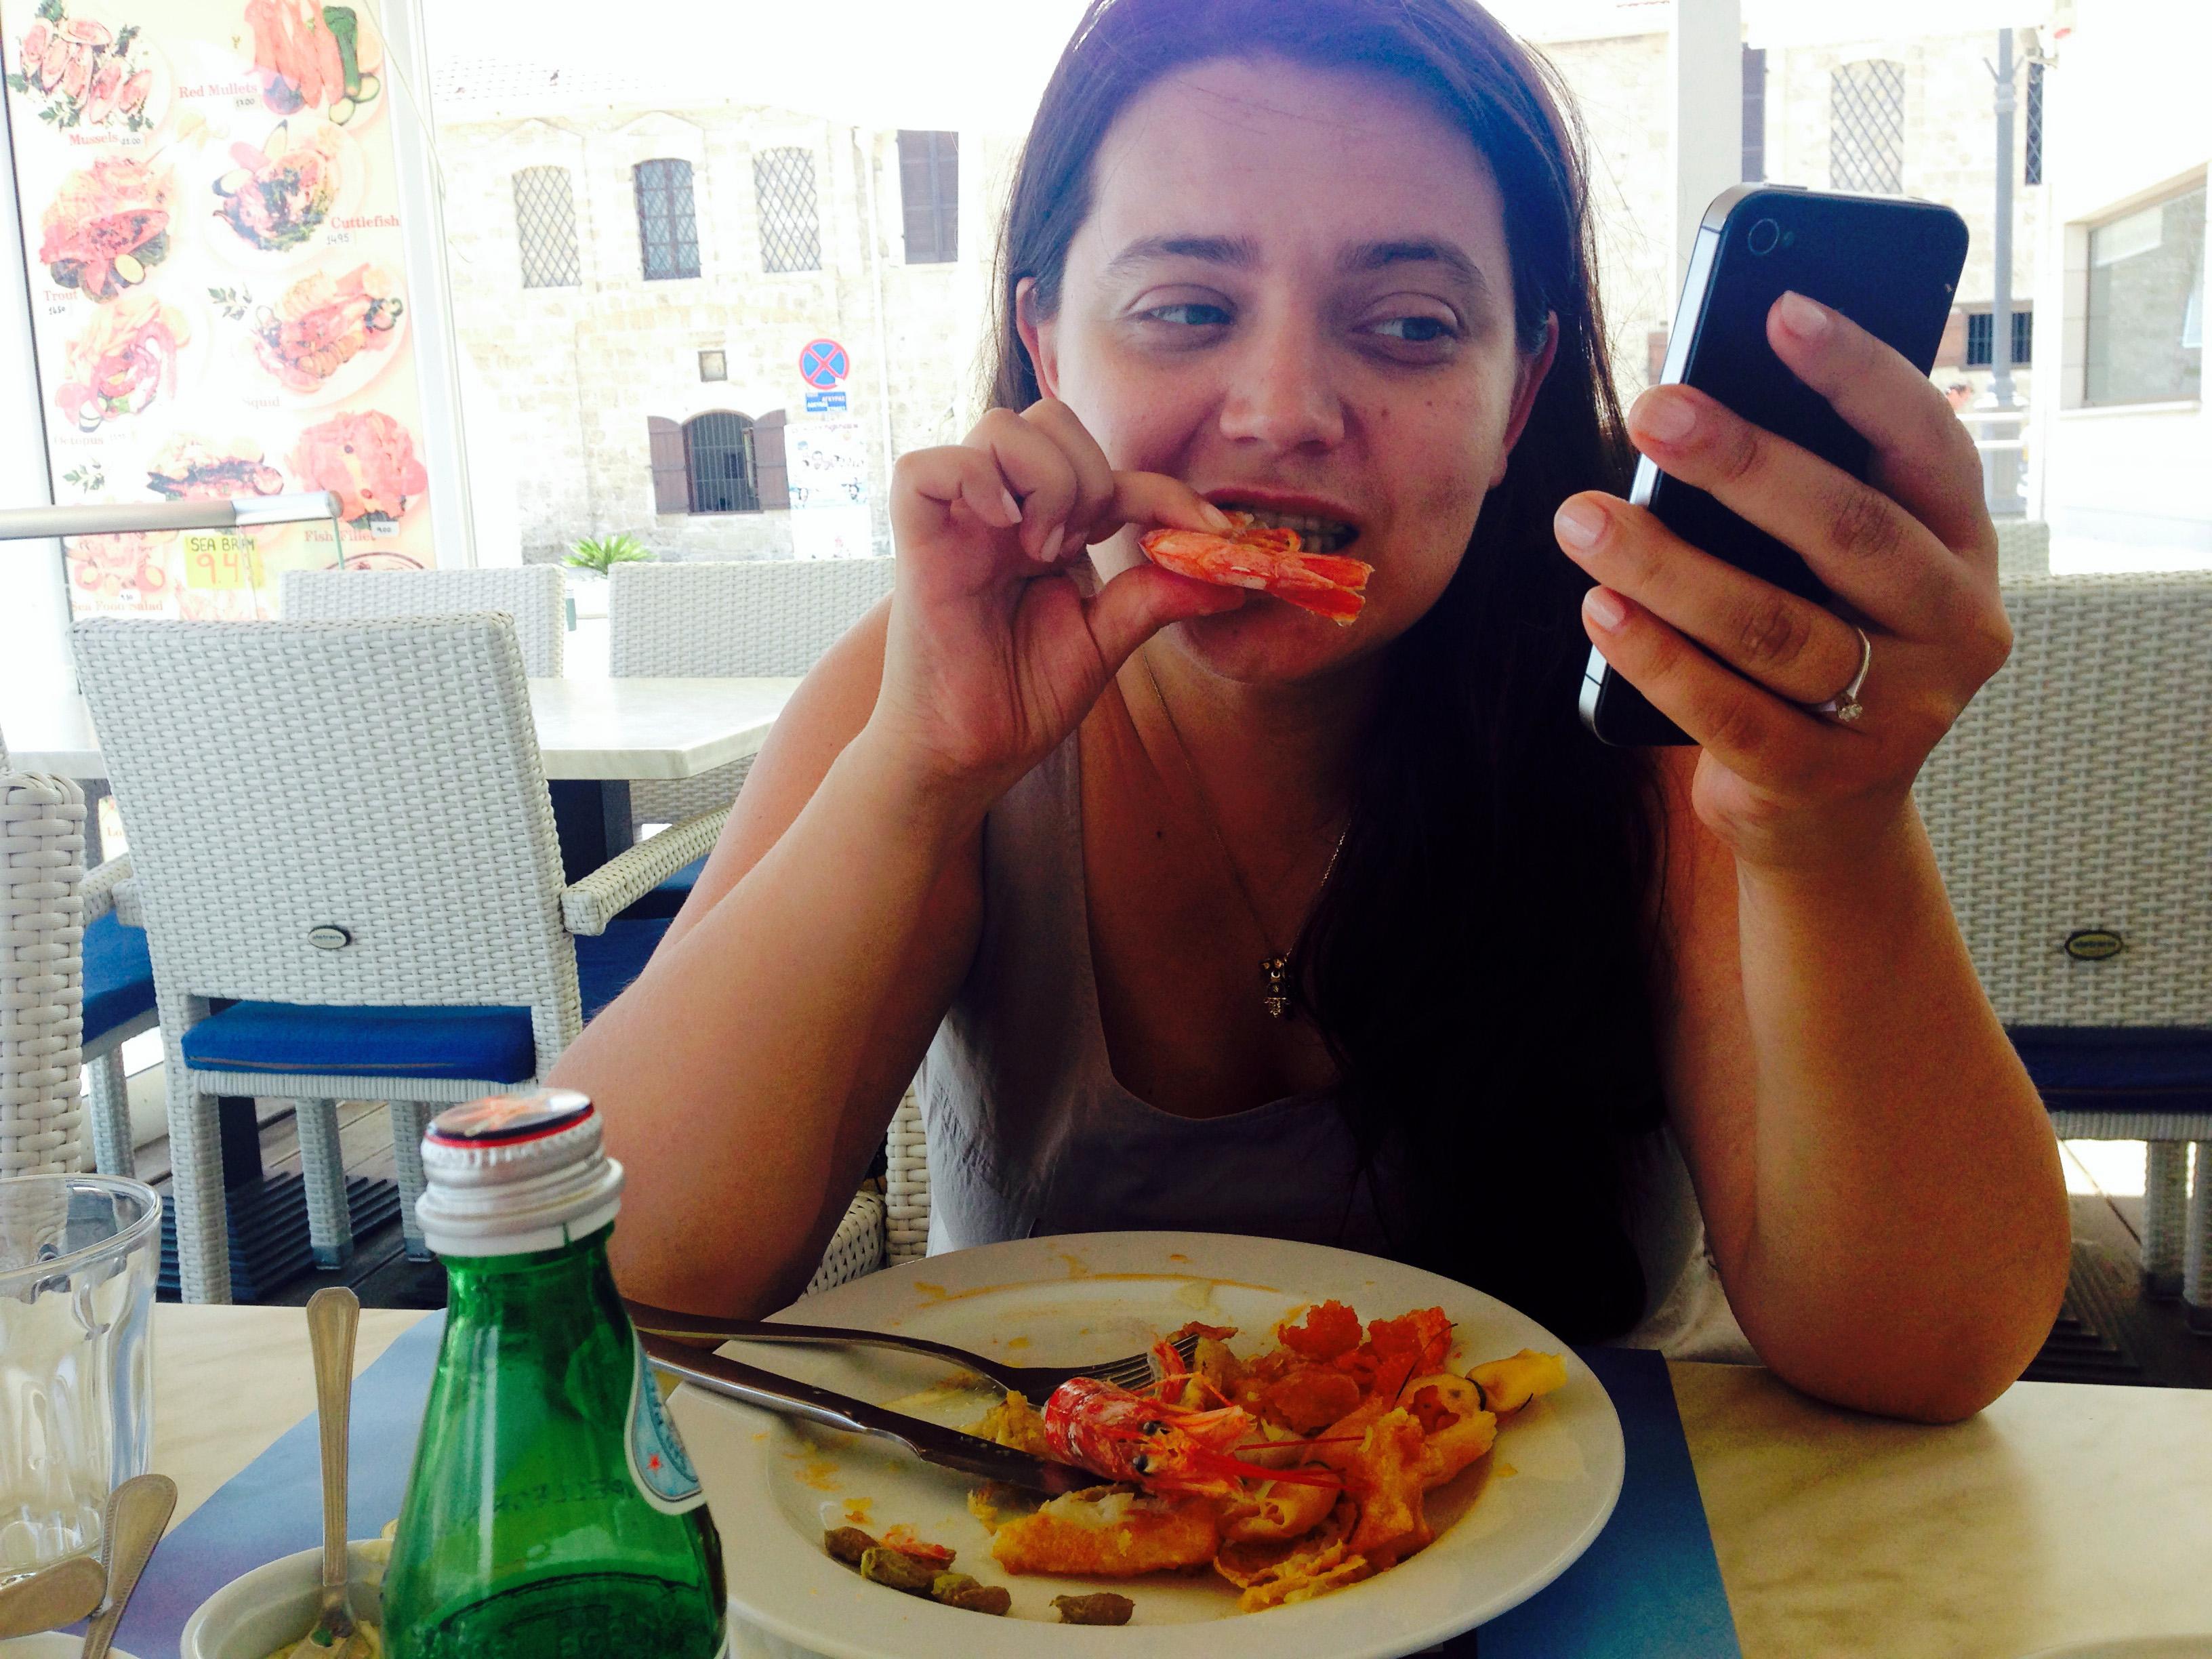 larnaca ana-maria shrimp facebook